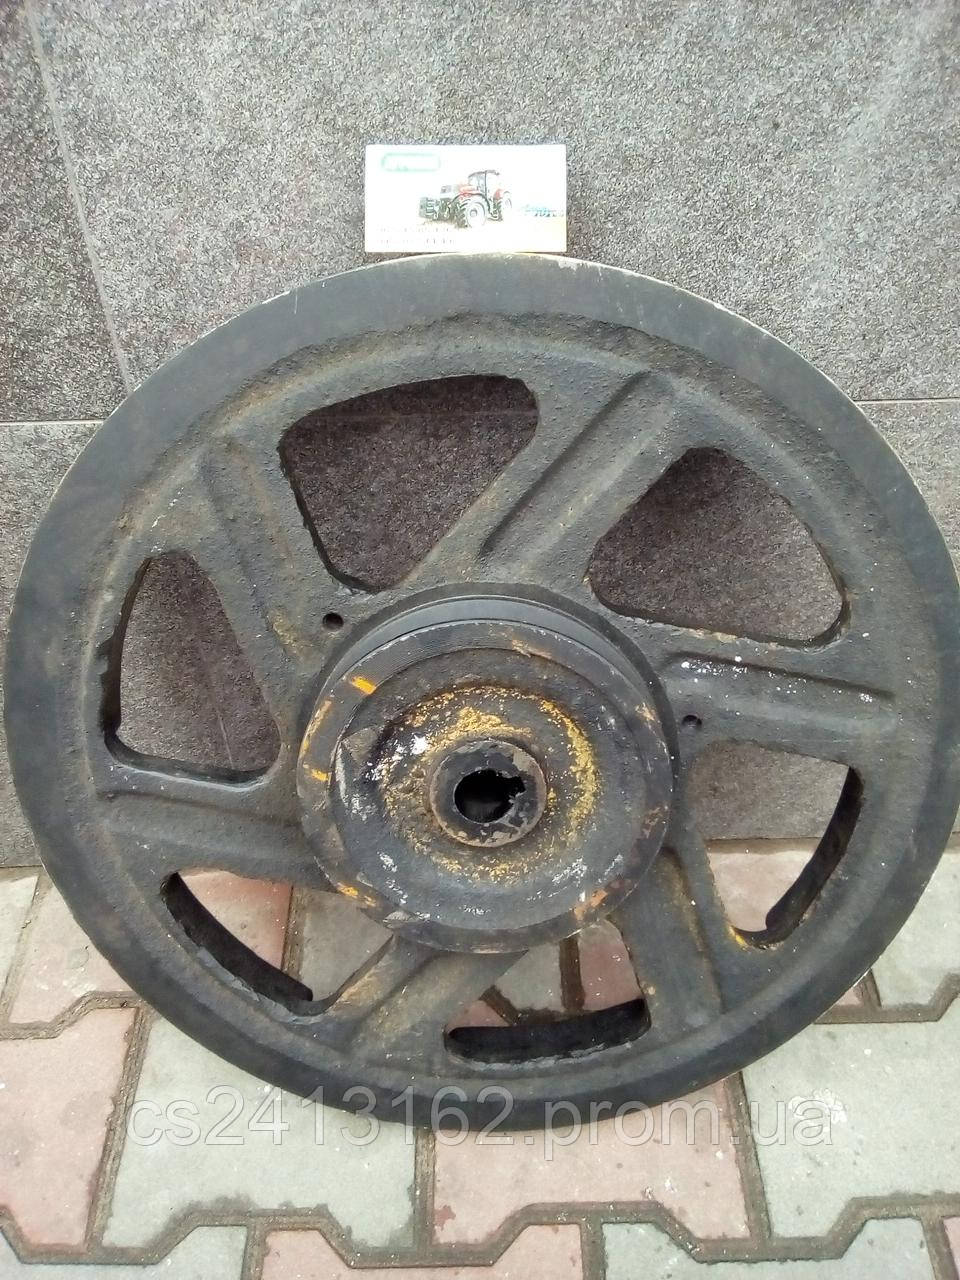 Шкив заднего контрпривода (левый, чугун) 54-2-170А комбайна Нива